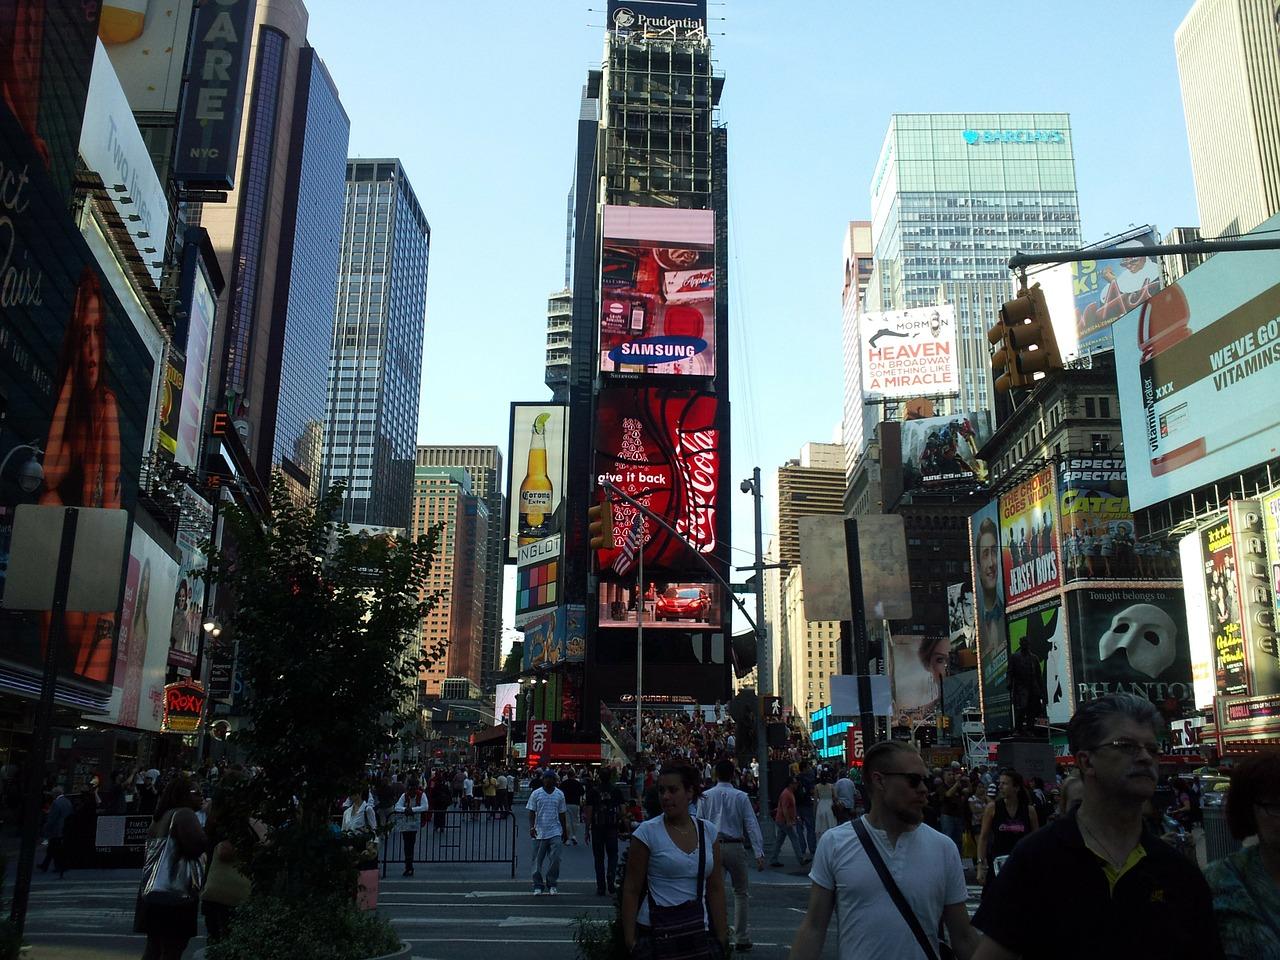 Warst du schonmal am Time Square